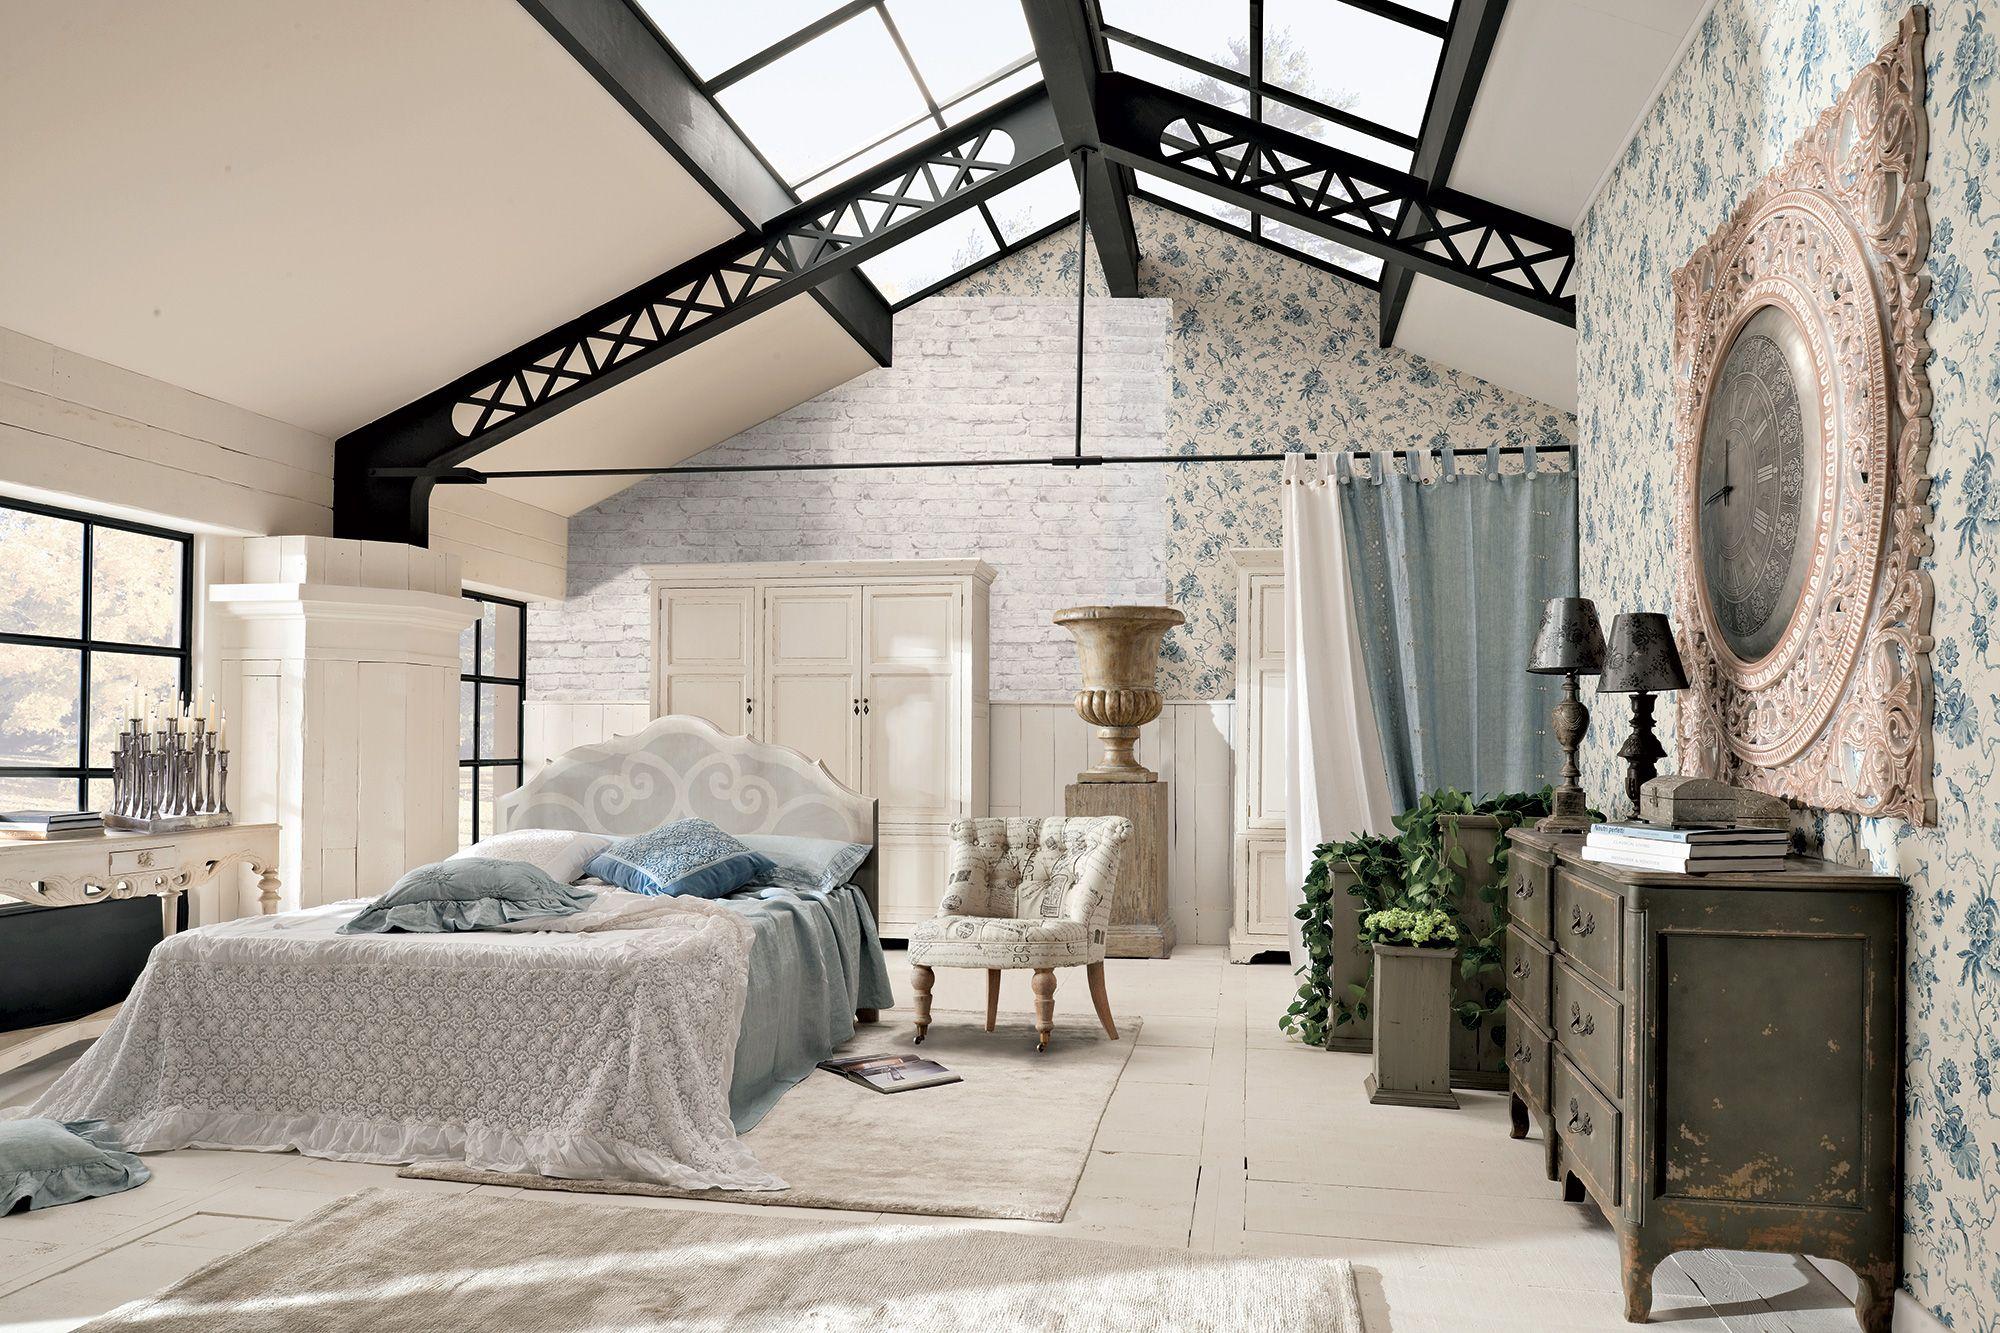 Classic arredamento ~ Arredamento country vintage industrial loft urban shabby chic